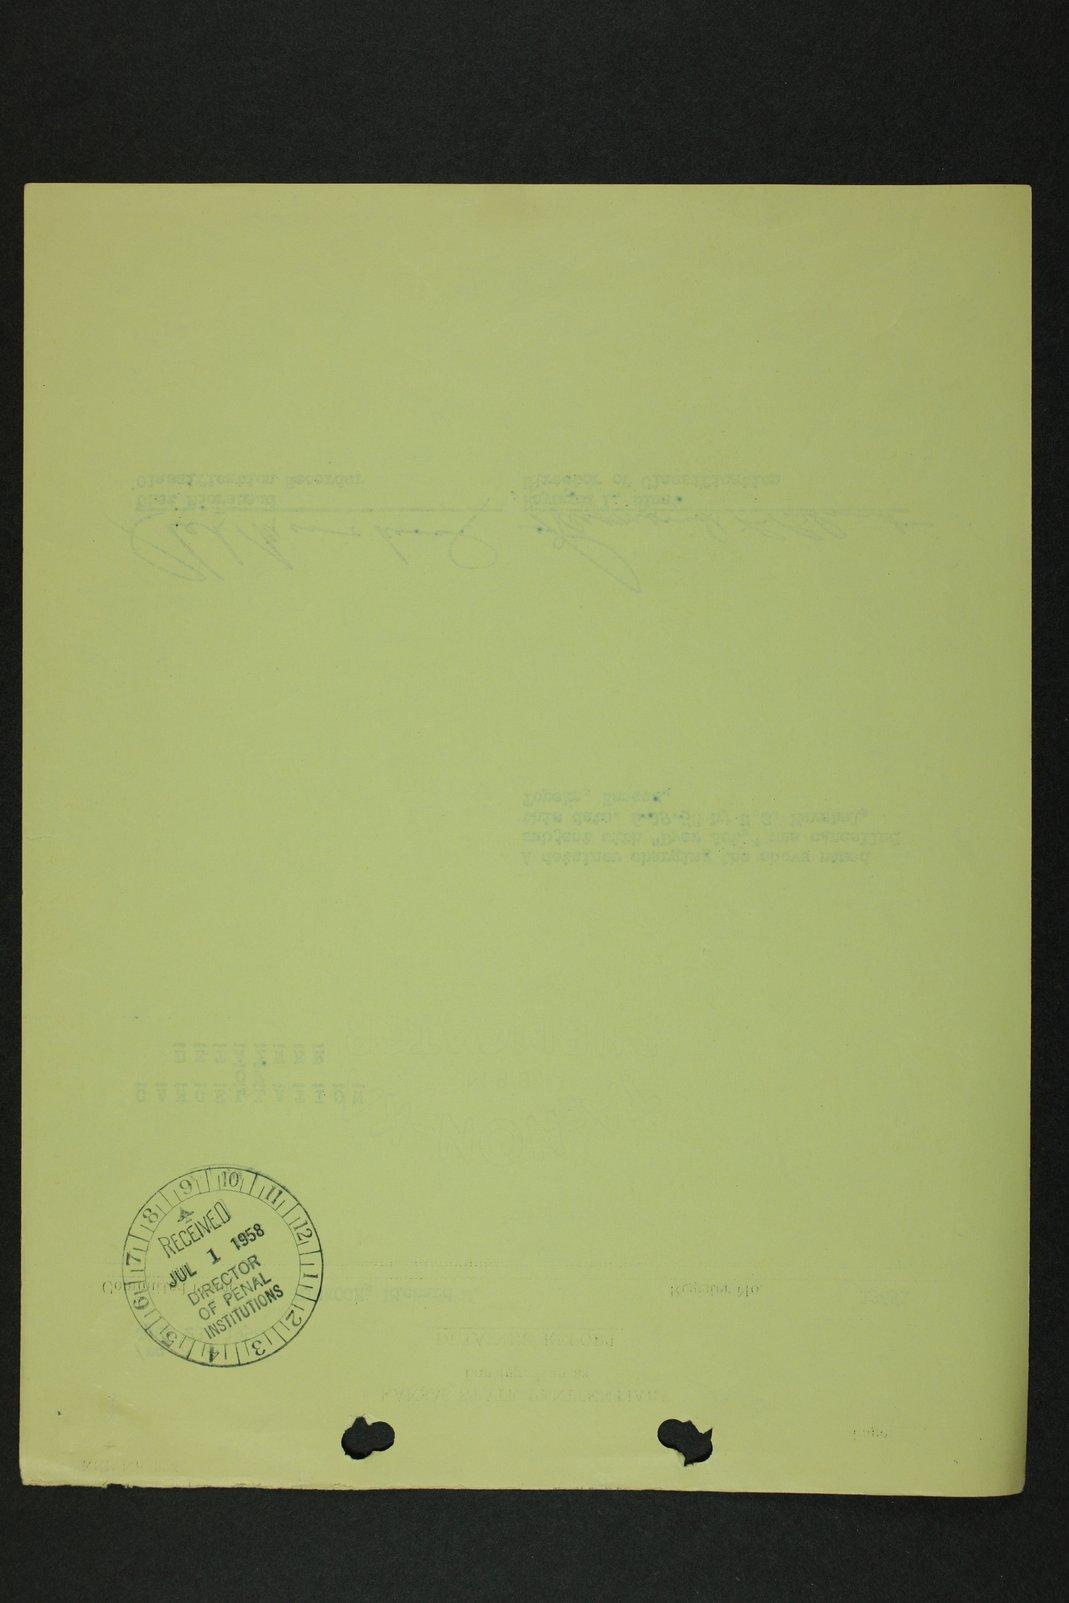 Richard Eugene Hickock inmate case file - 11